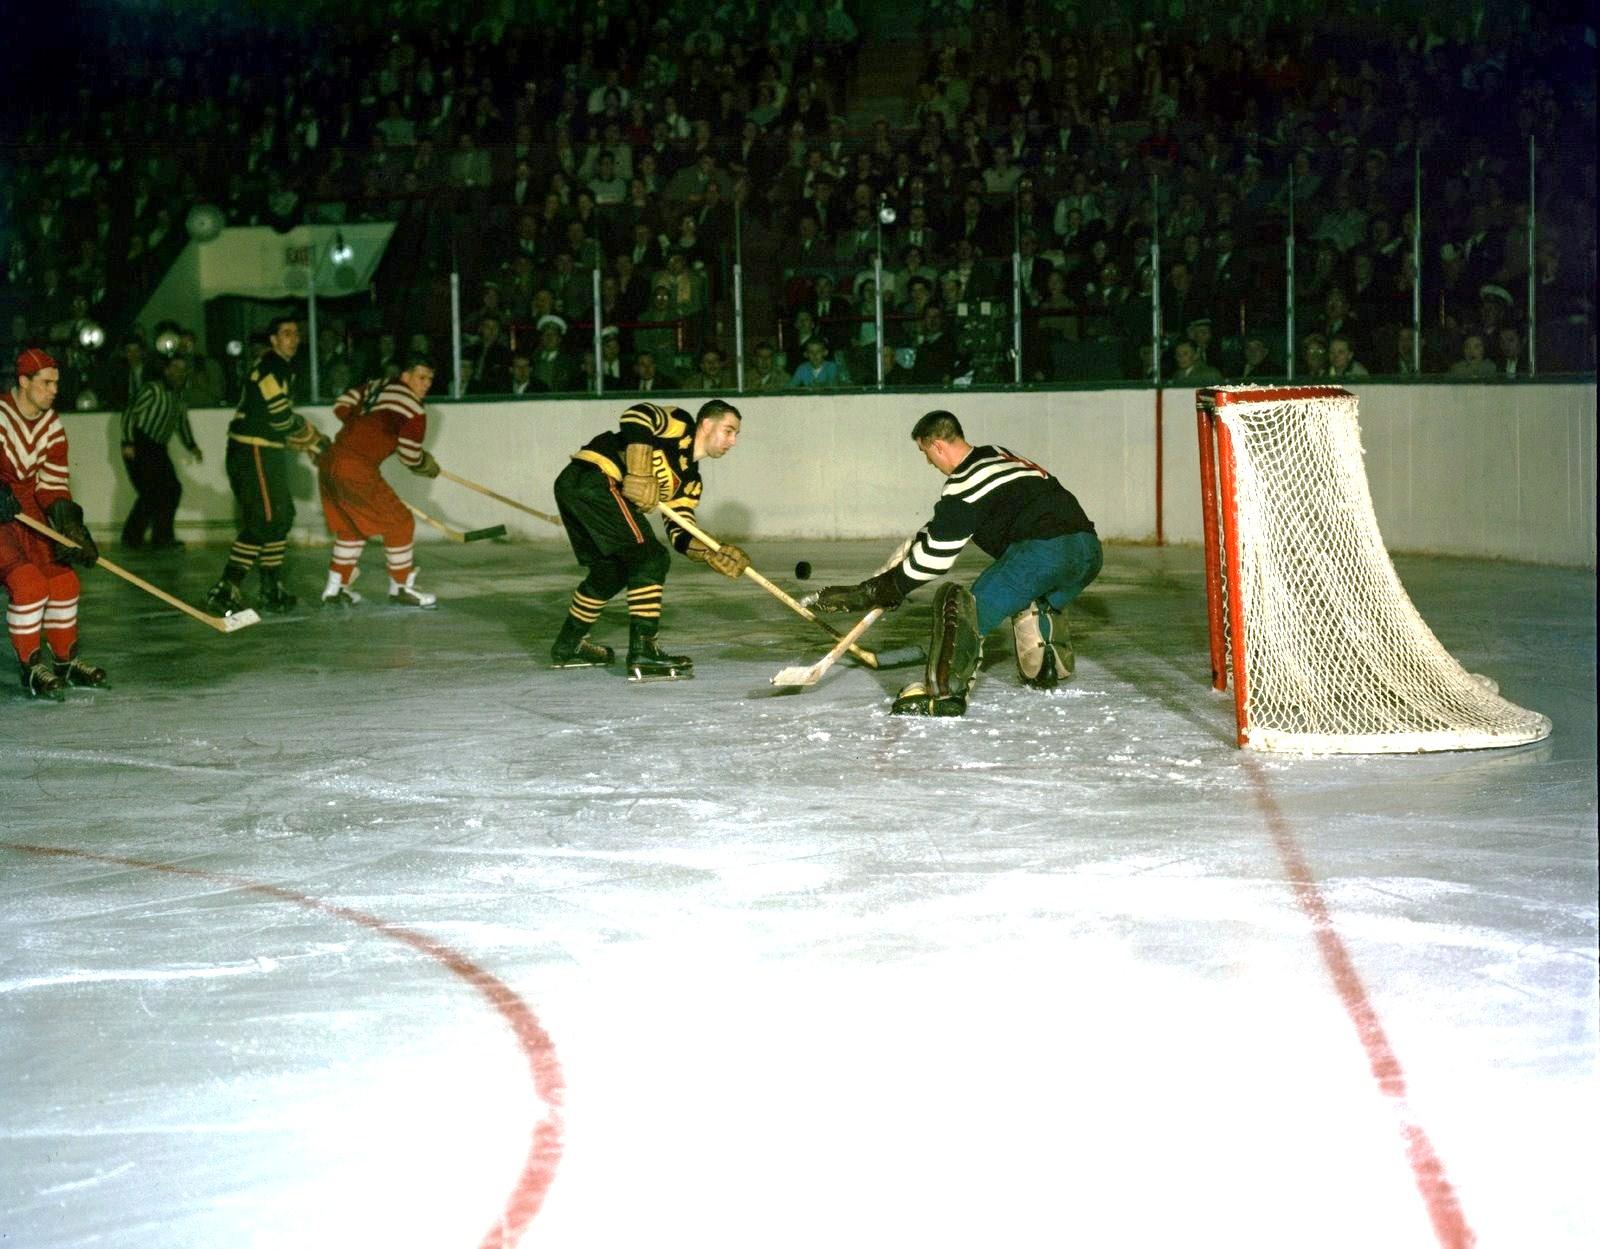 Dunlop.vs.Ru. Toronto.nov-57. Tjerep.o.Ivanov. Erkin.jpg